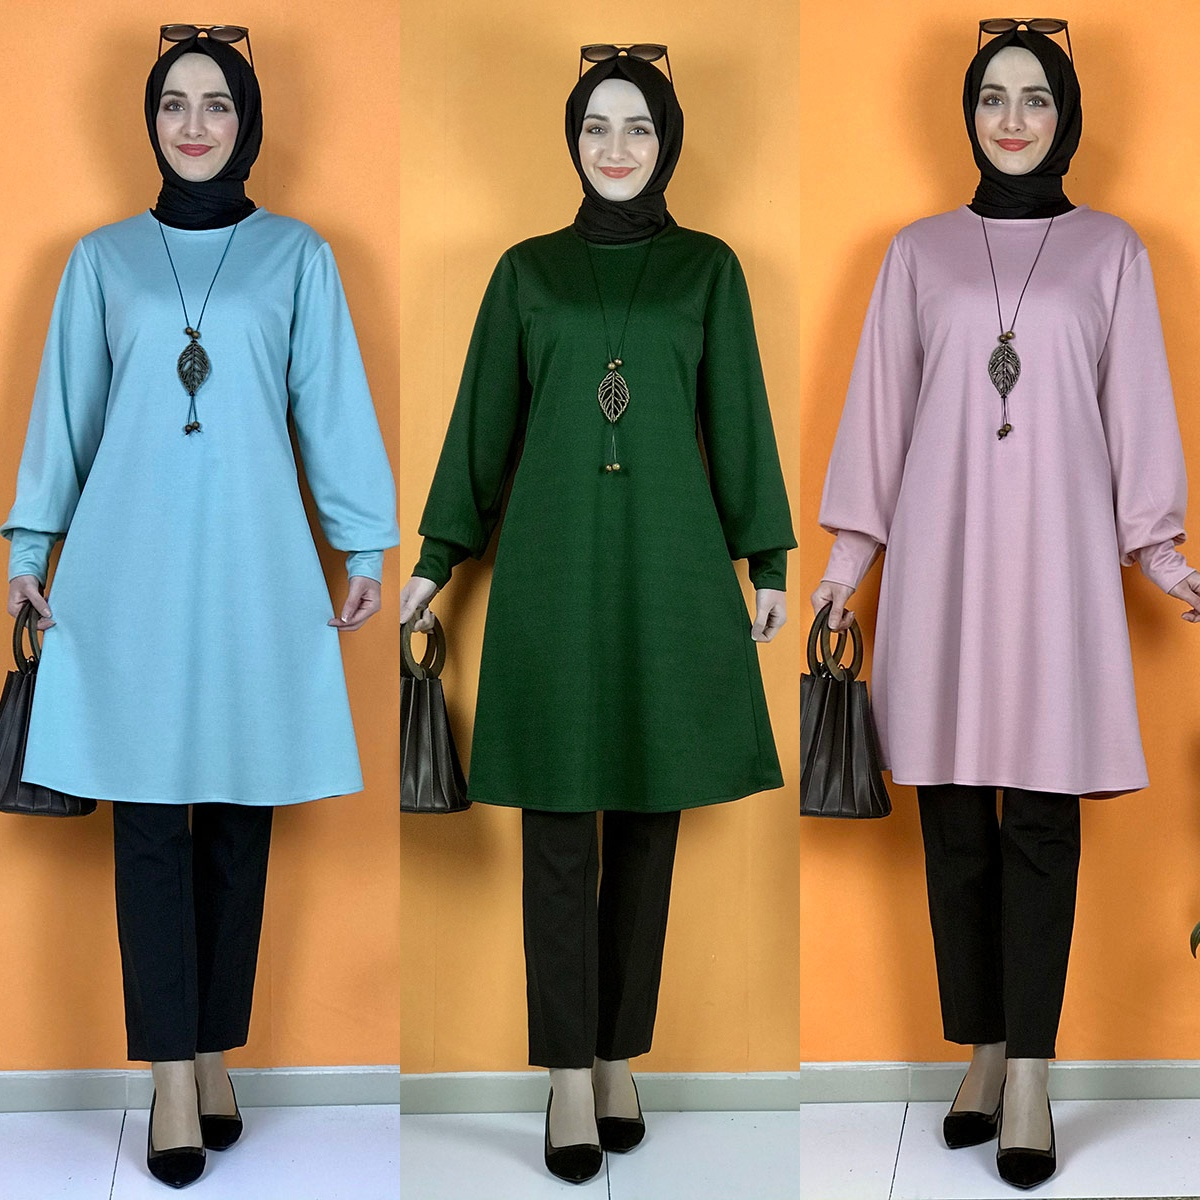 5XL 6XL Plus Size Women Tops 2021 Blouse Shirt Long Sleeve Tunic Muslim Fashion Femme Top Casual Solid Shirts Blusas Spring New